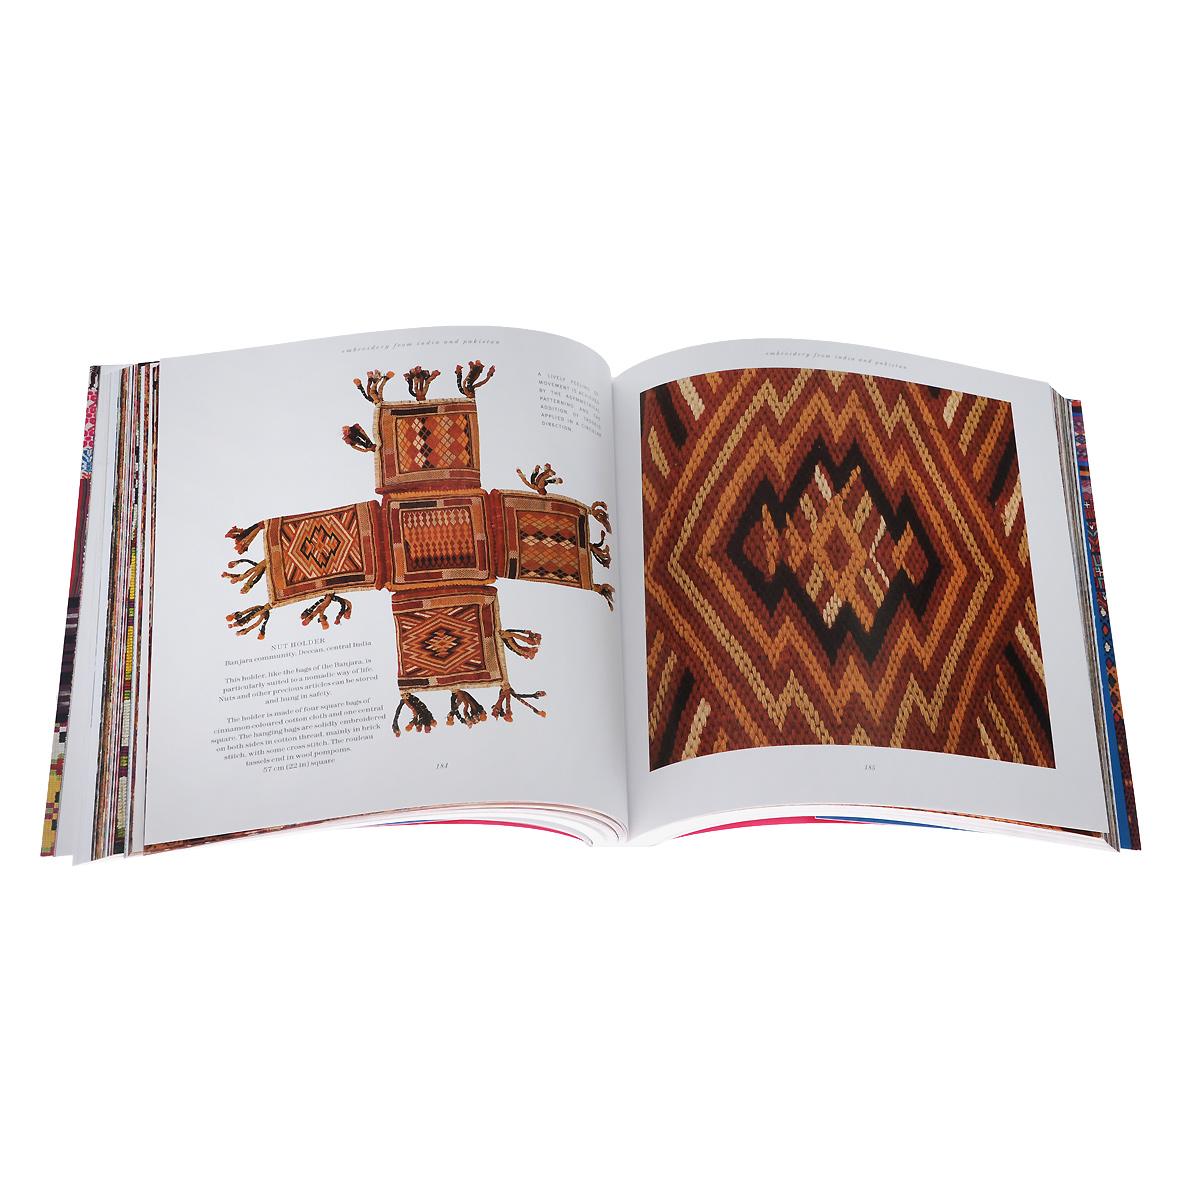 World Textiles: А Sourcebook